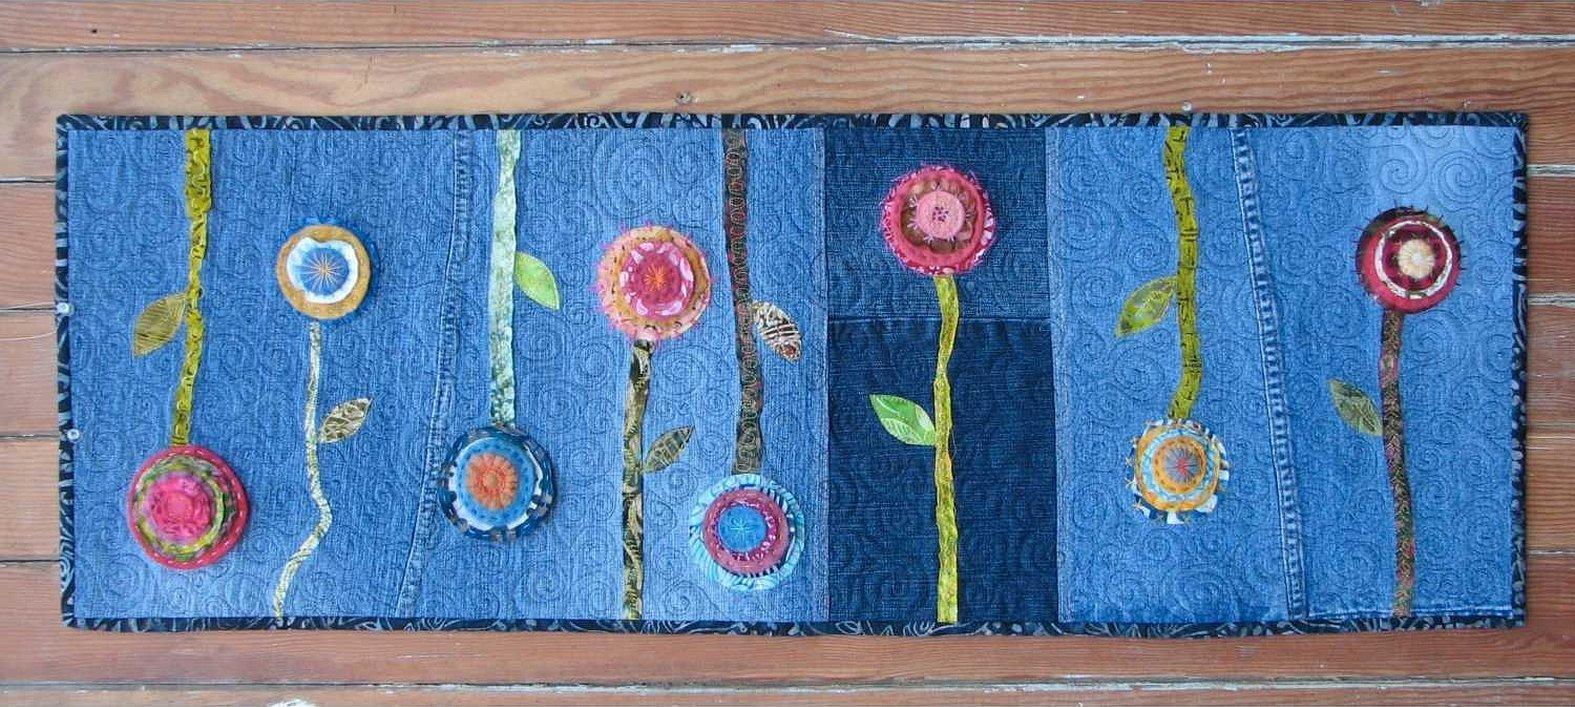 Вышивка и аппликация из ткани и ниток картина